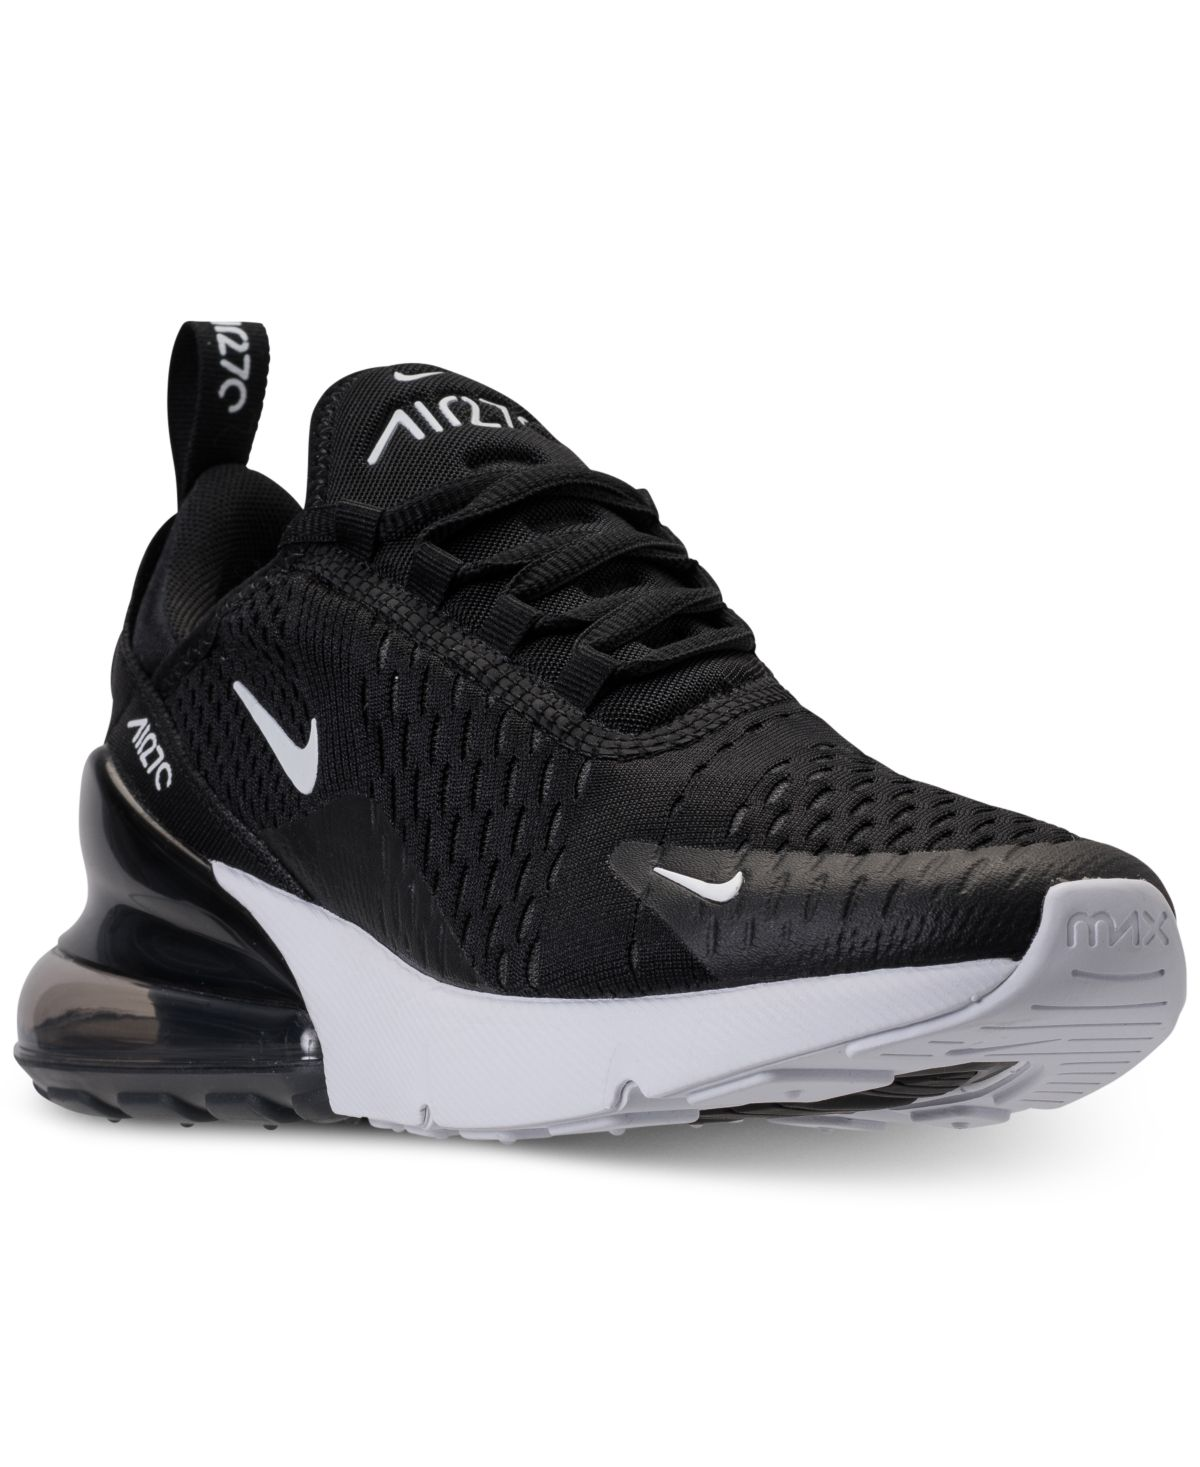 Black nike shoes, Sneakers nike air max